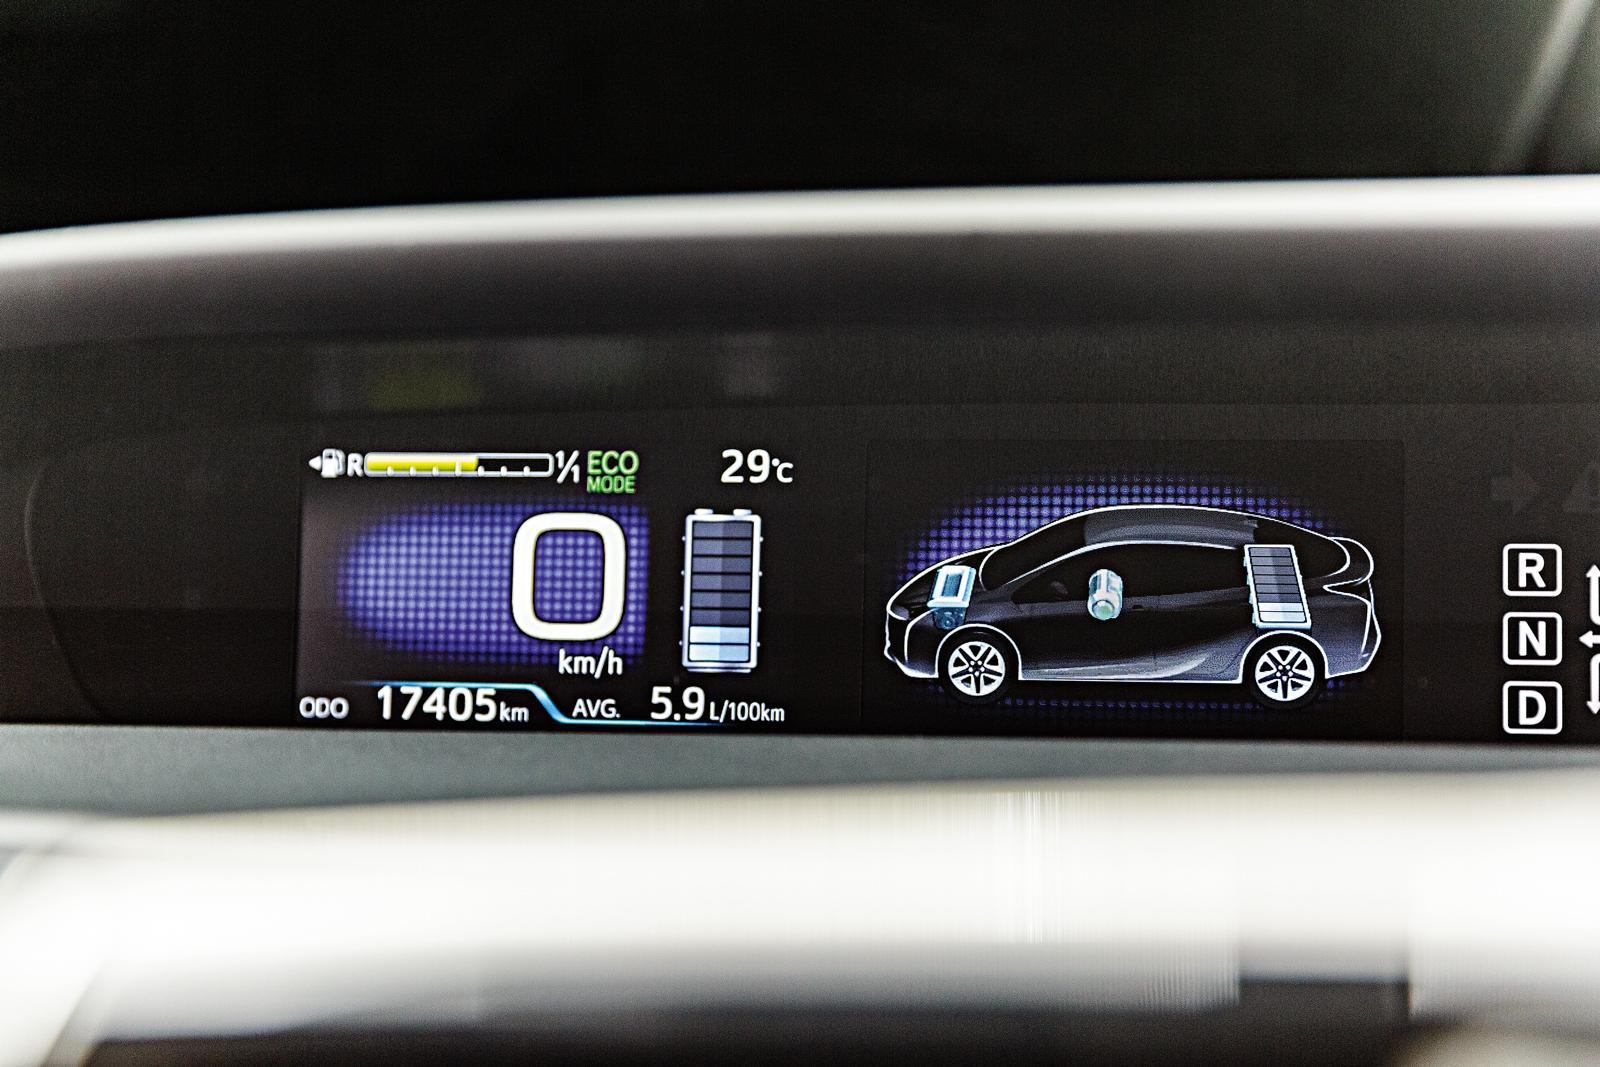 Painel do Prius mostra carga da bateria